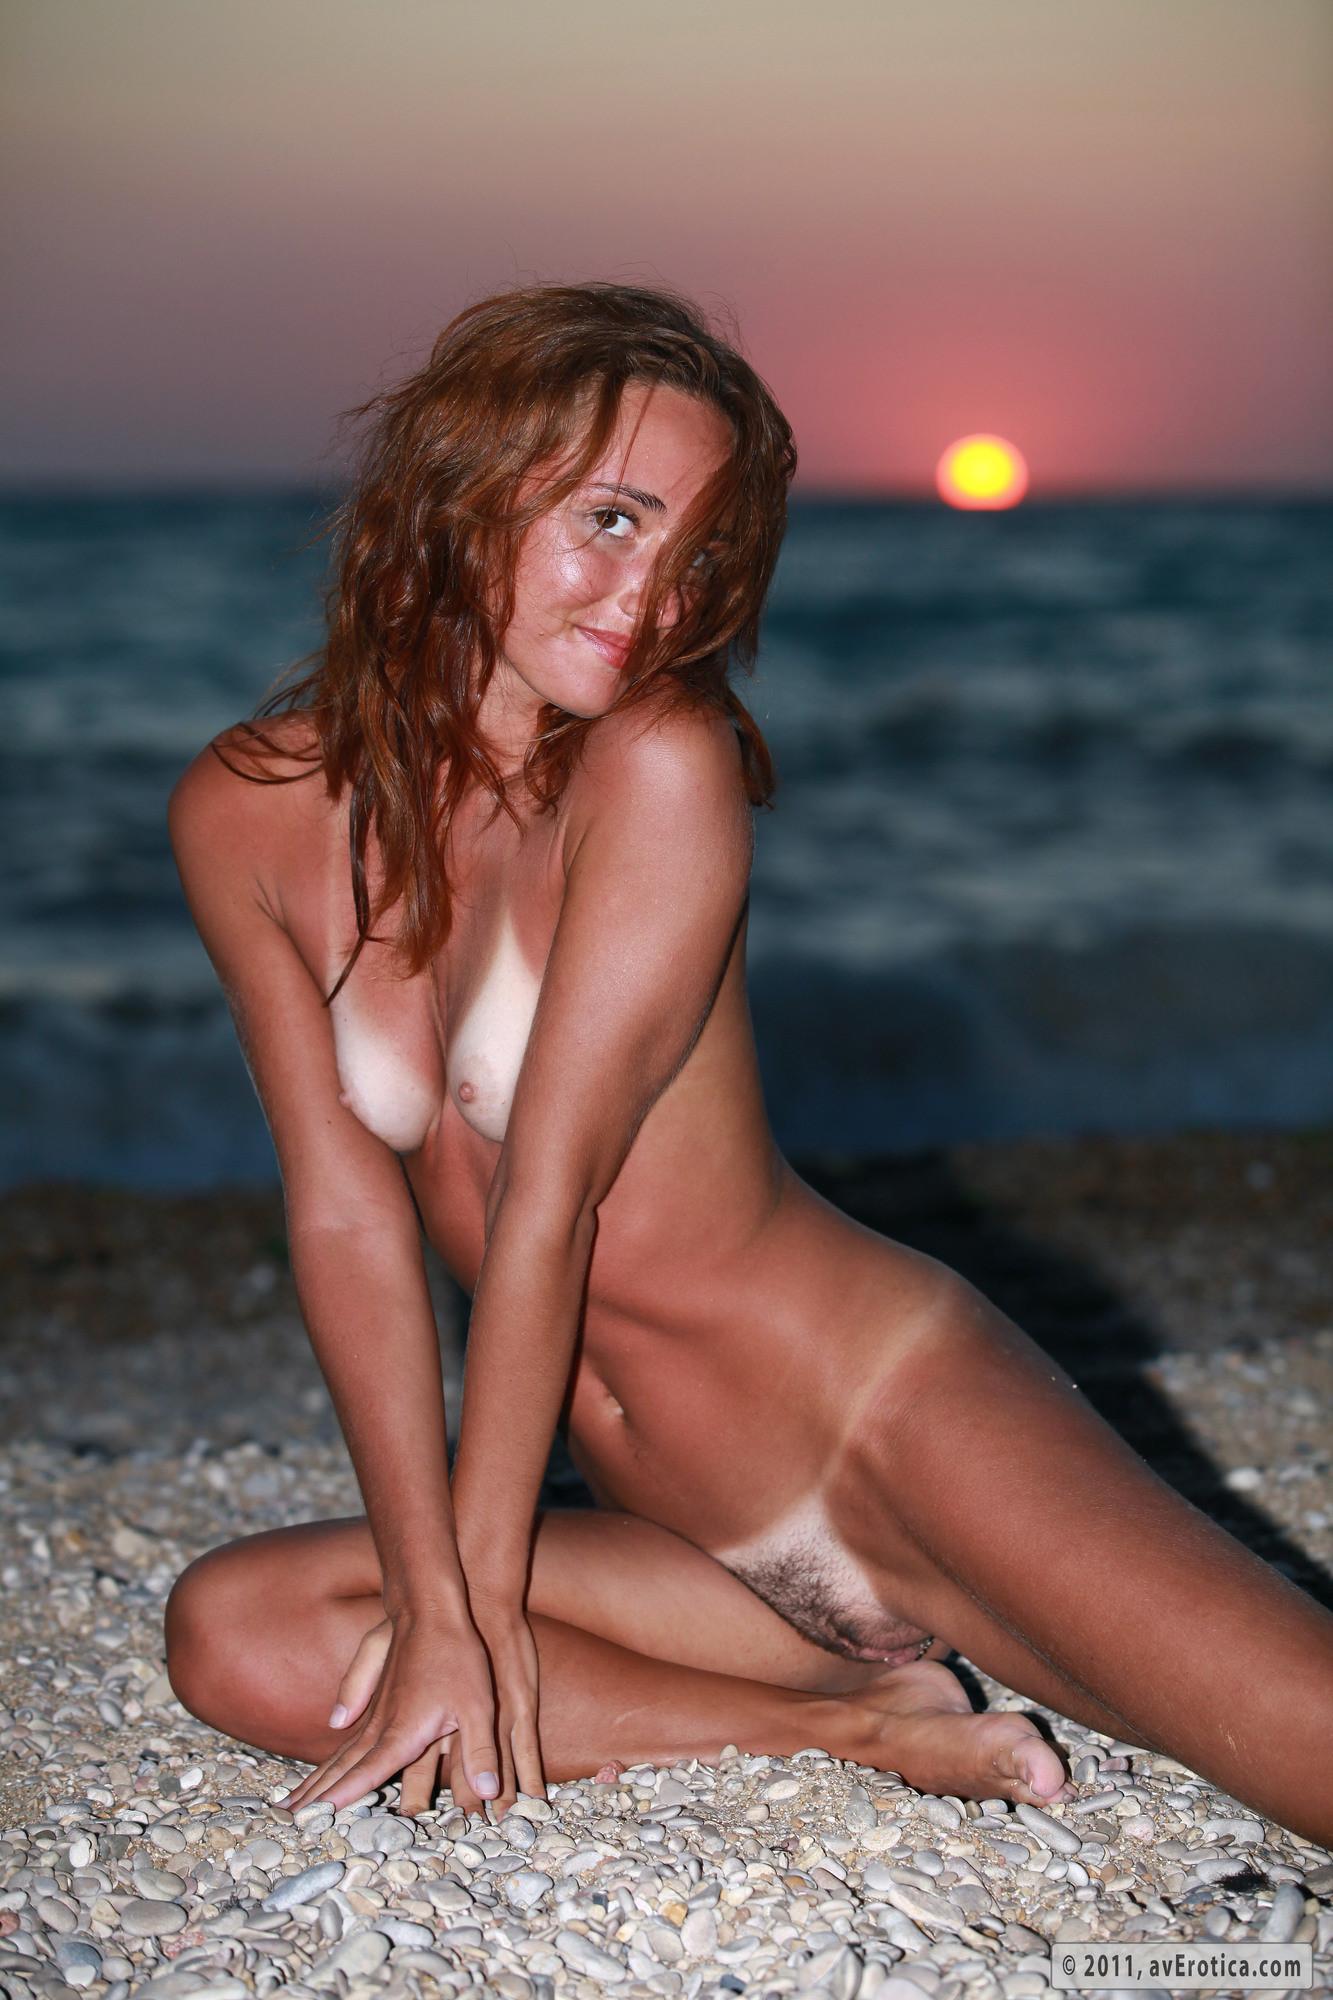 Nudes On Beach